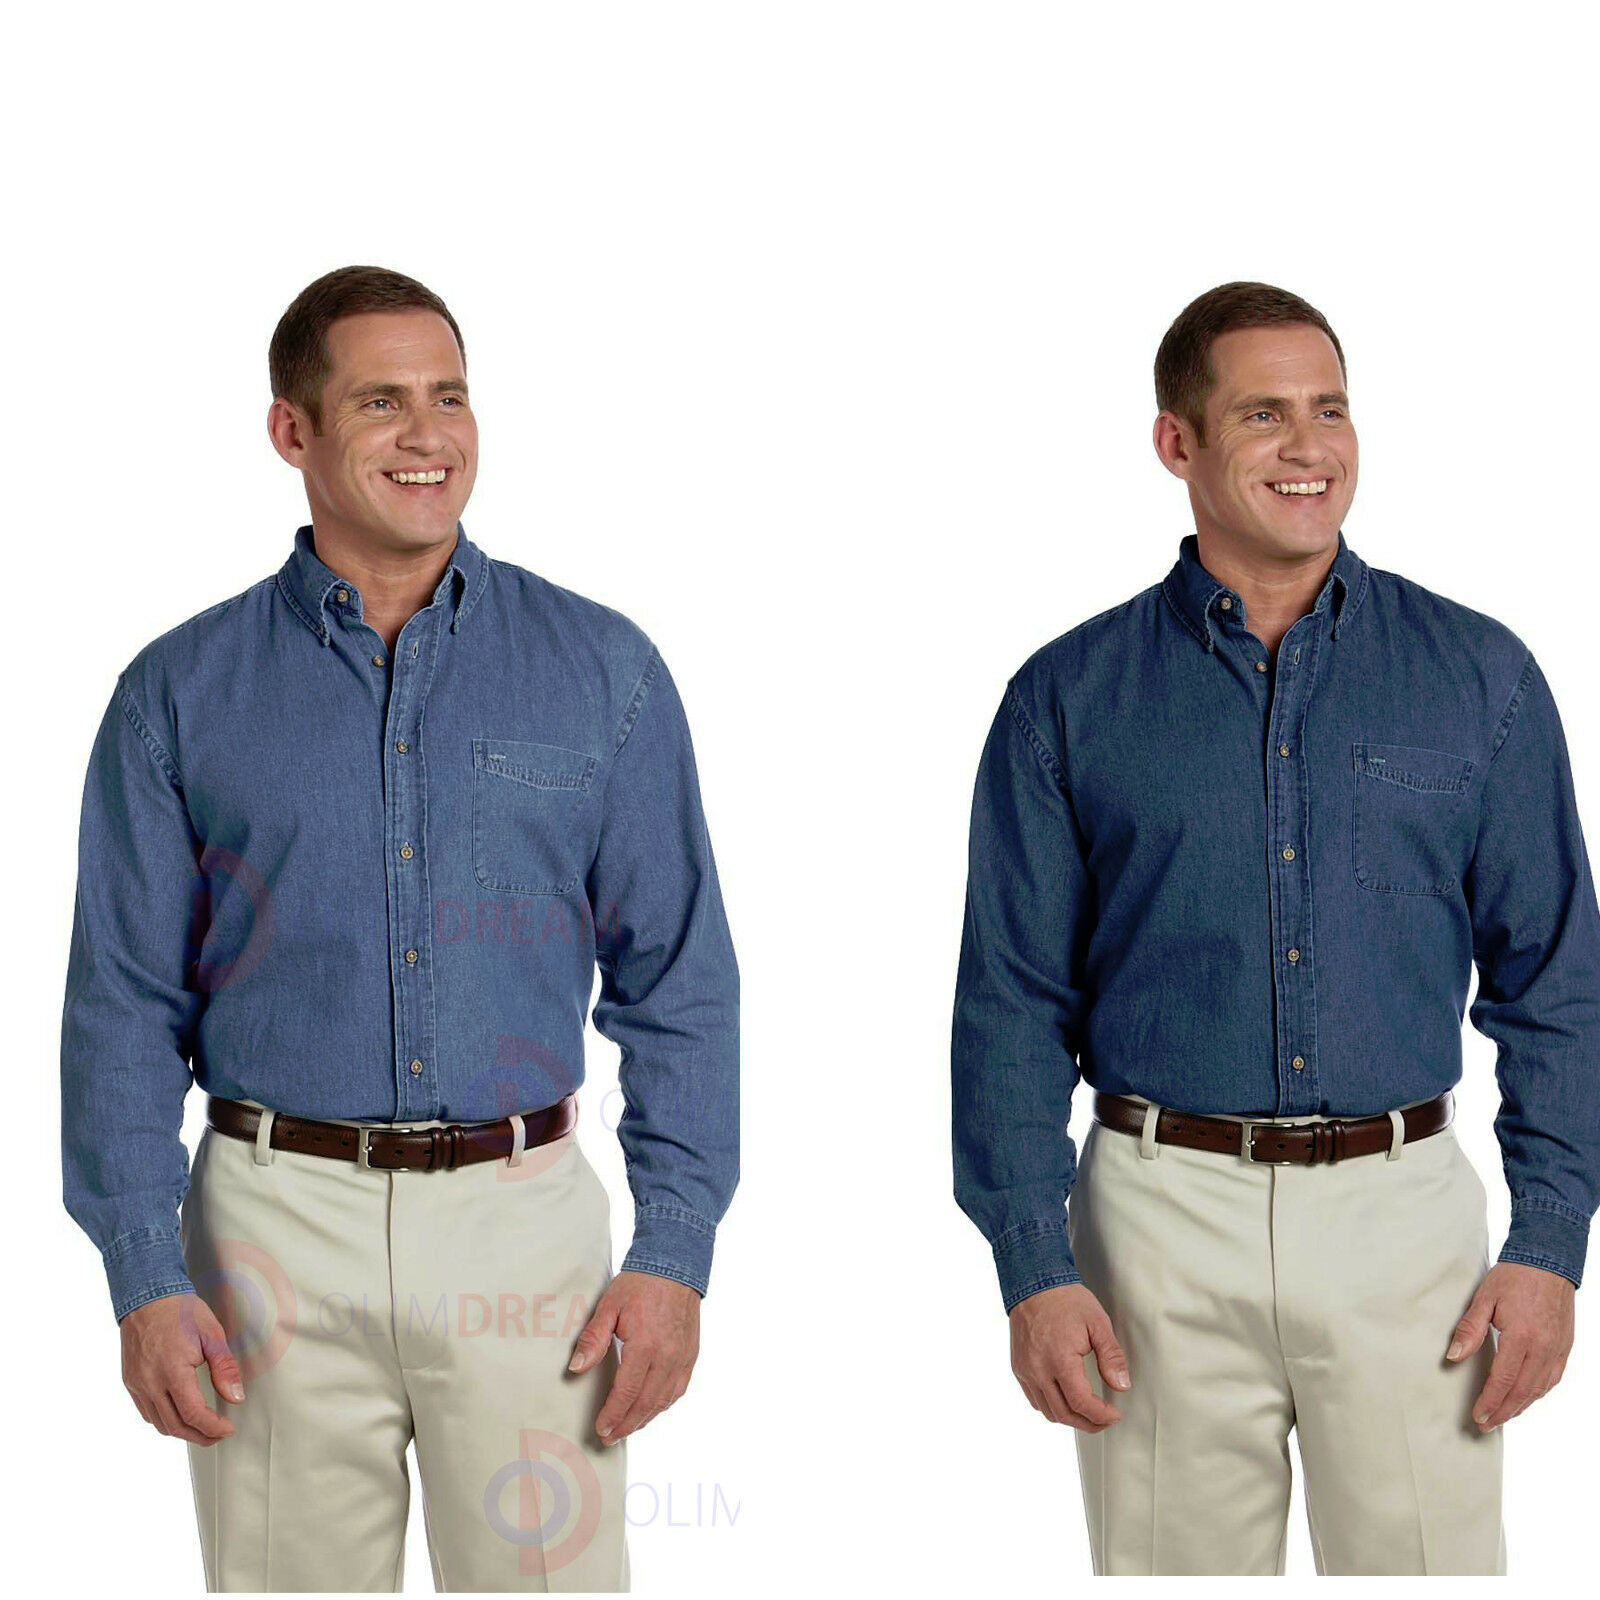 da677a8326d Harriton Men s Cotton Casual Long-Sleeve Denim Shirt M550 S-6XL